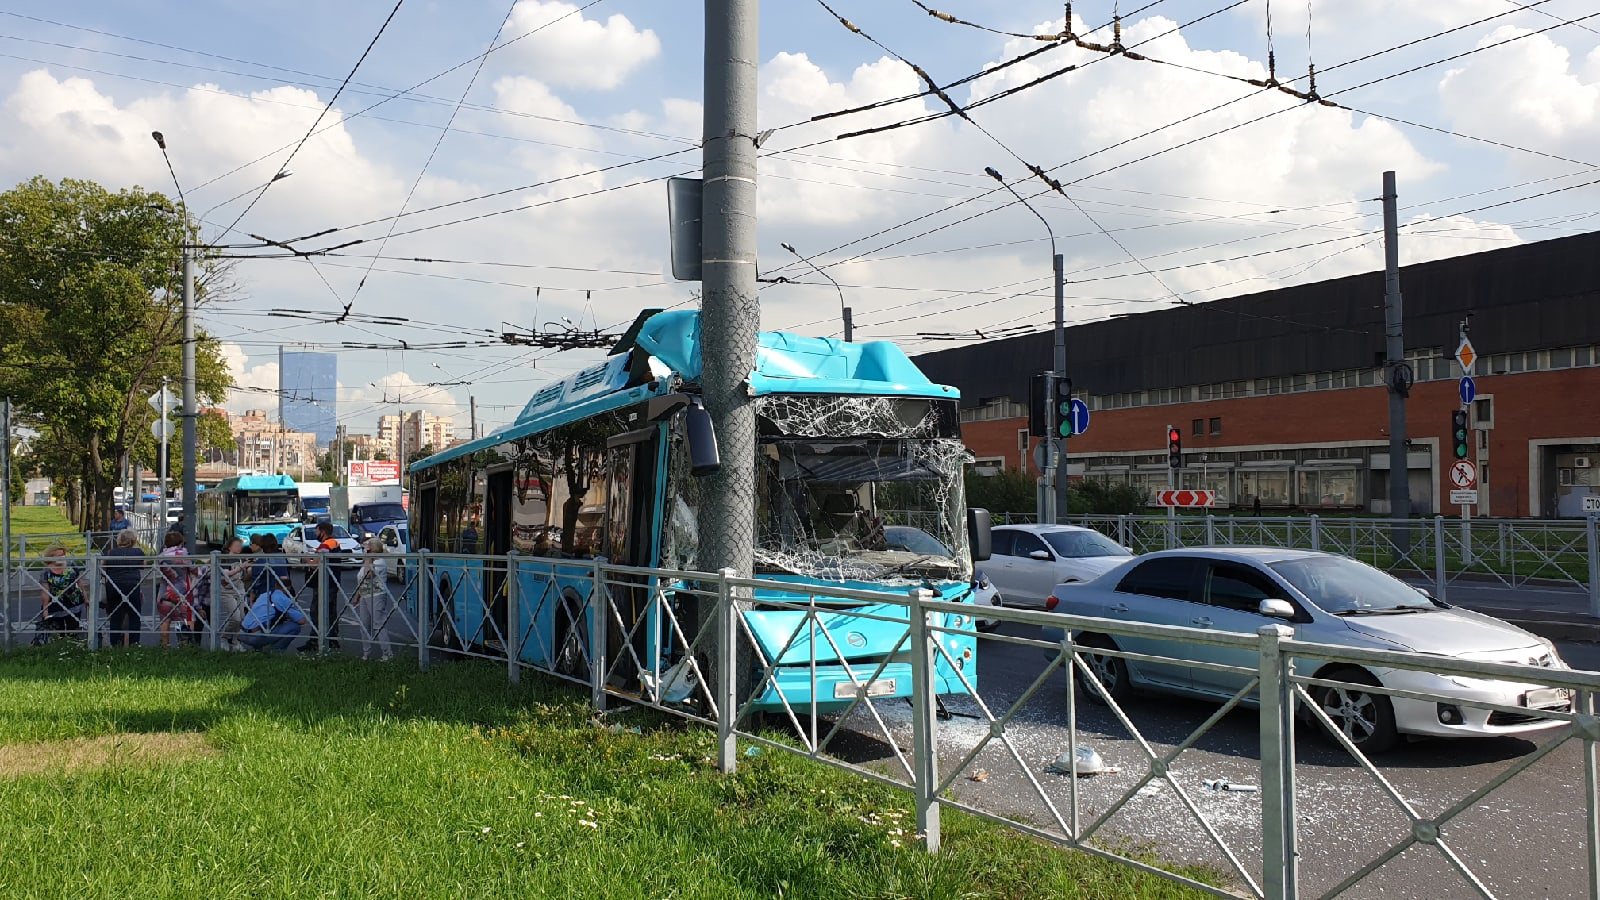 Наезд автобуса на столб на Ленинском проспекте попал на видео